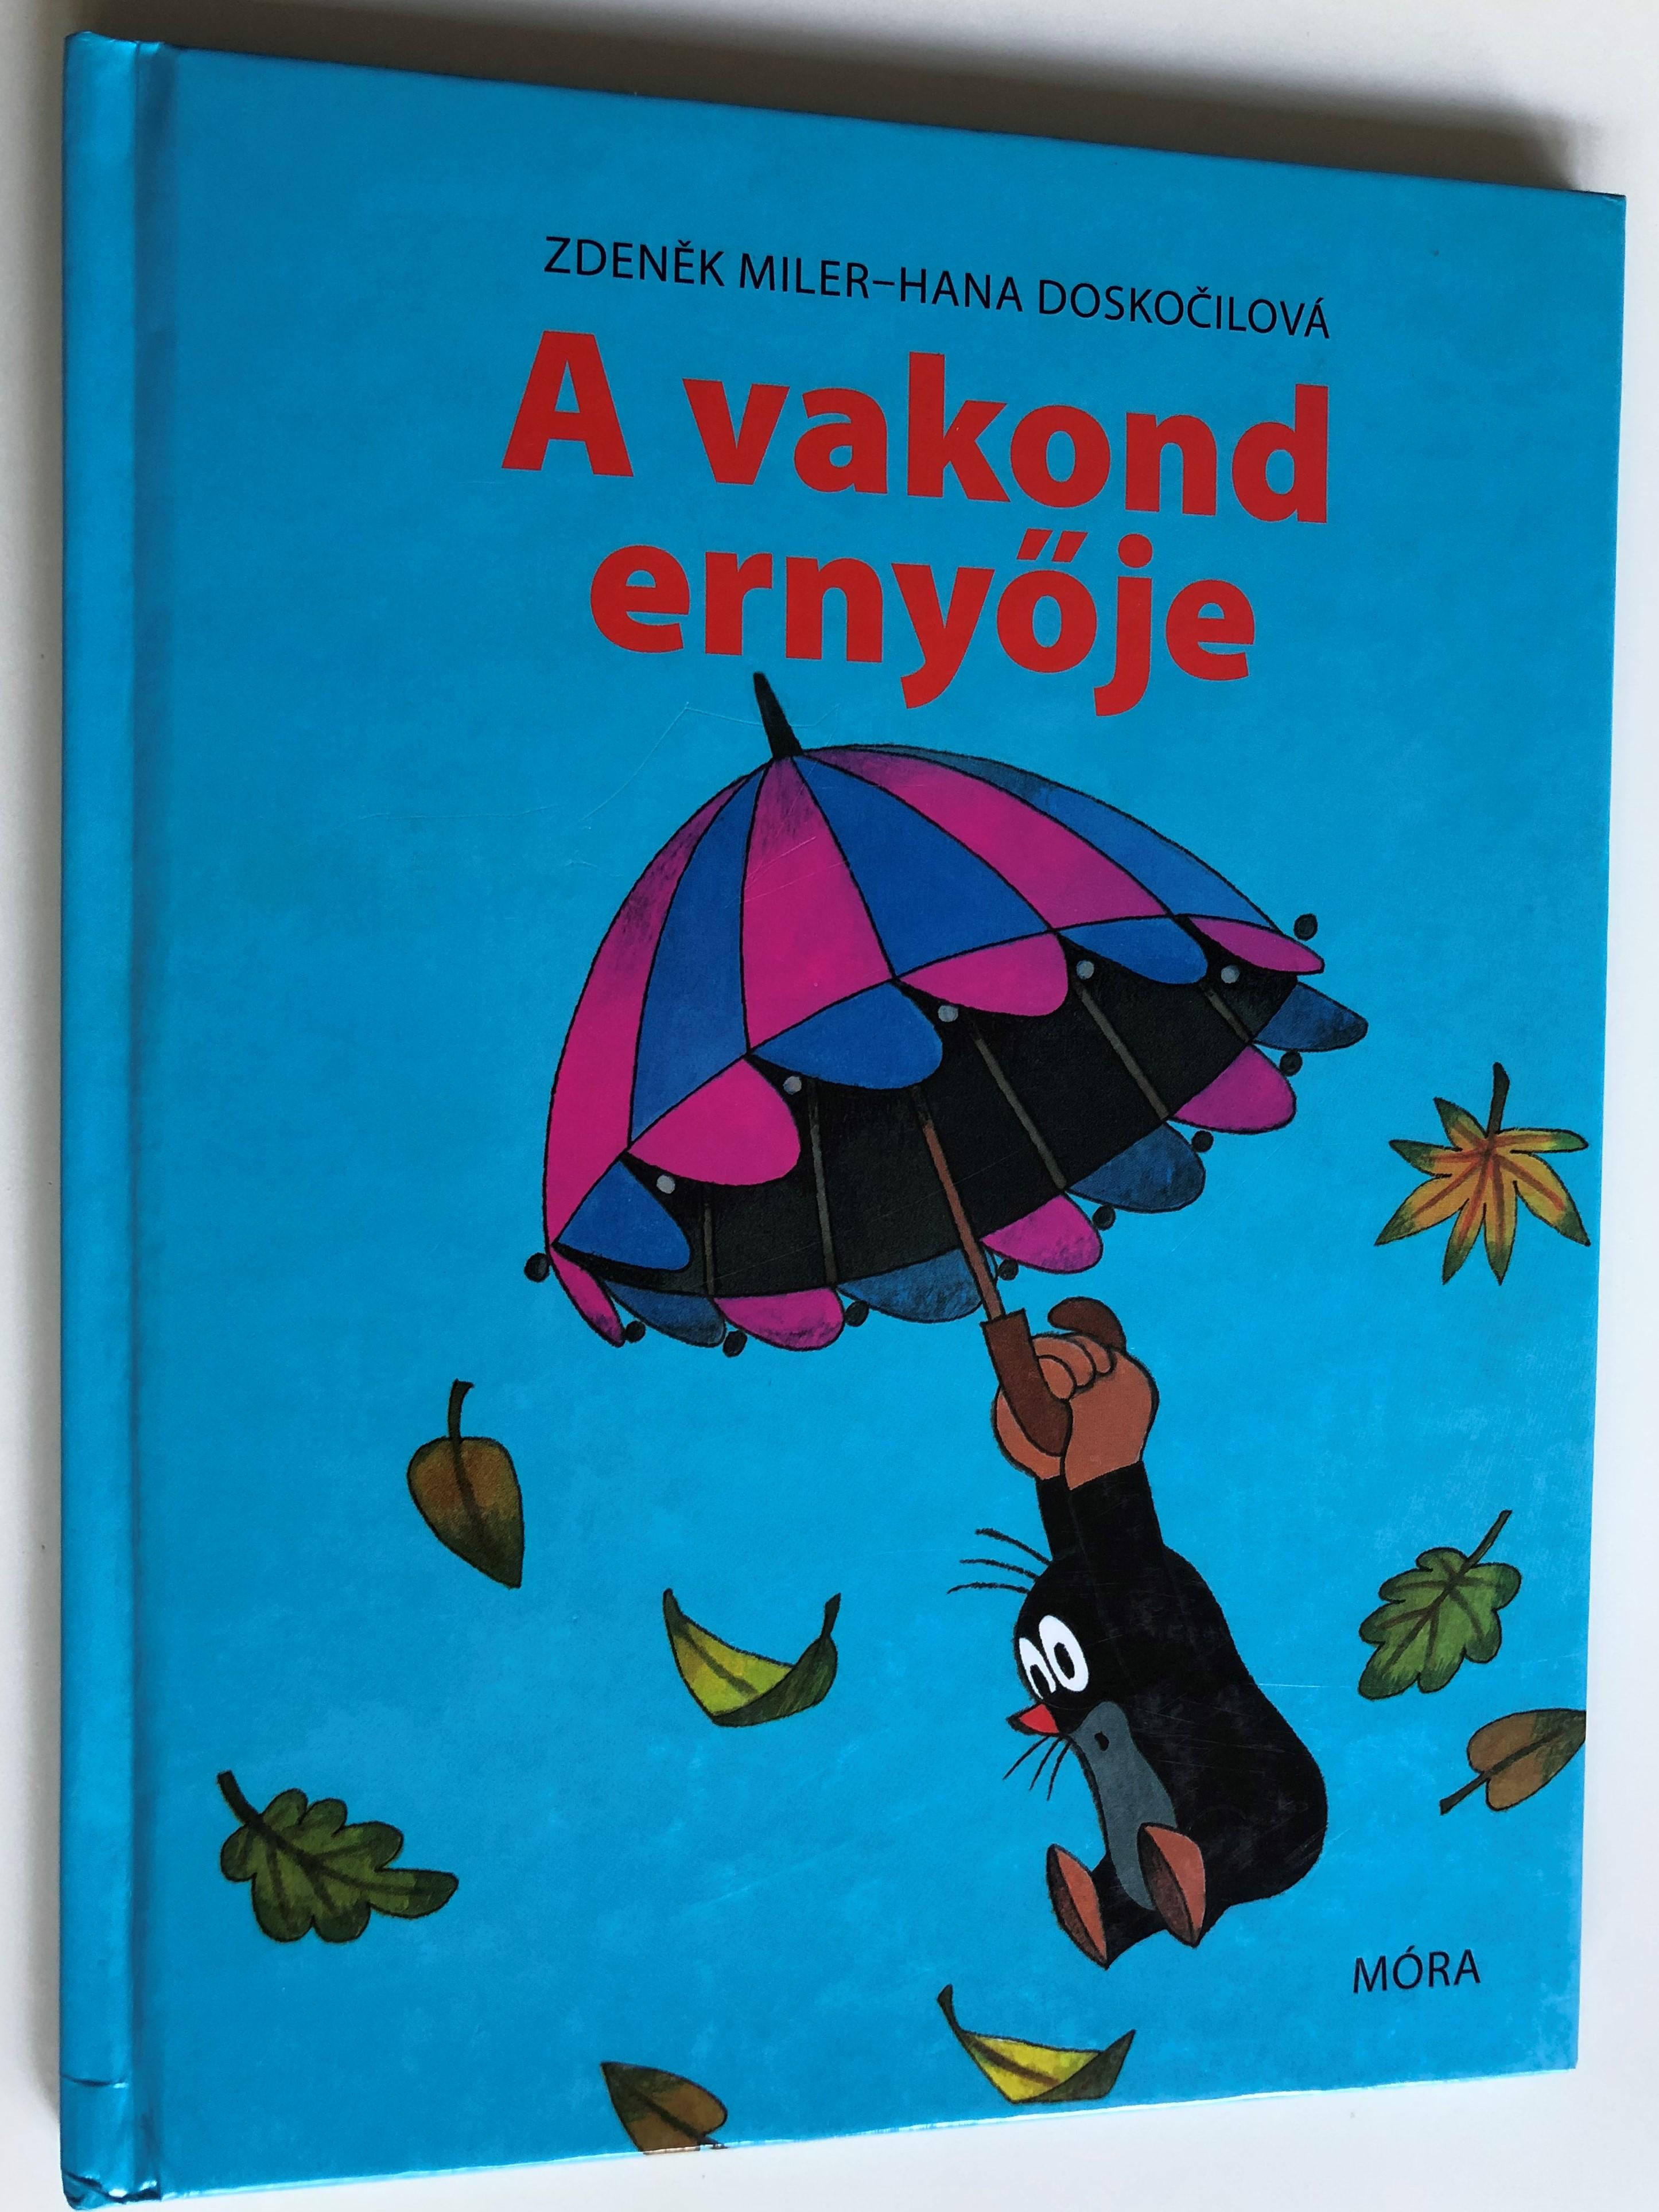 a-vakond-erny-je-by-zdenek-miler-hana-dosko-ilov-hungarian-translation-of-m-ra-k-nyvkiad-2007-1-.jpg